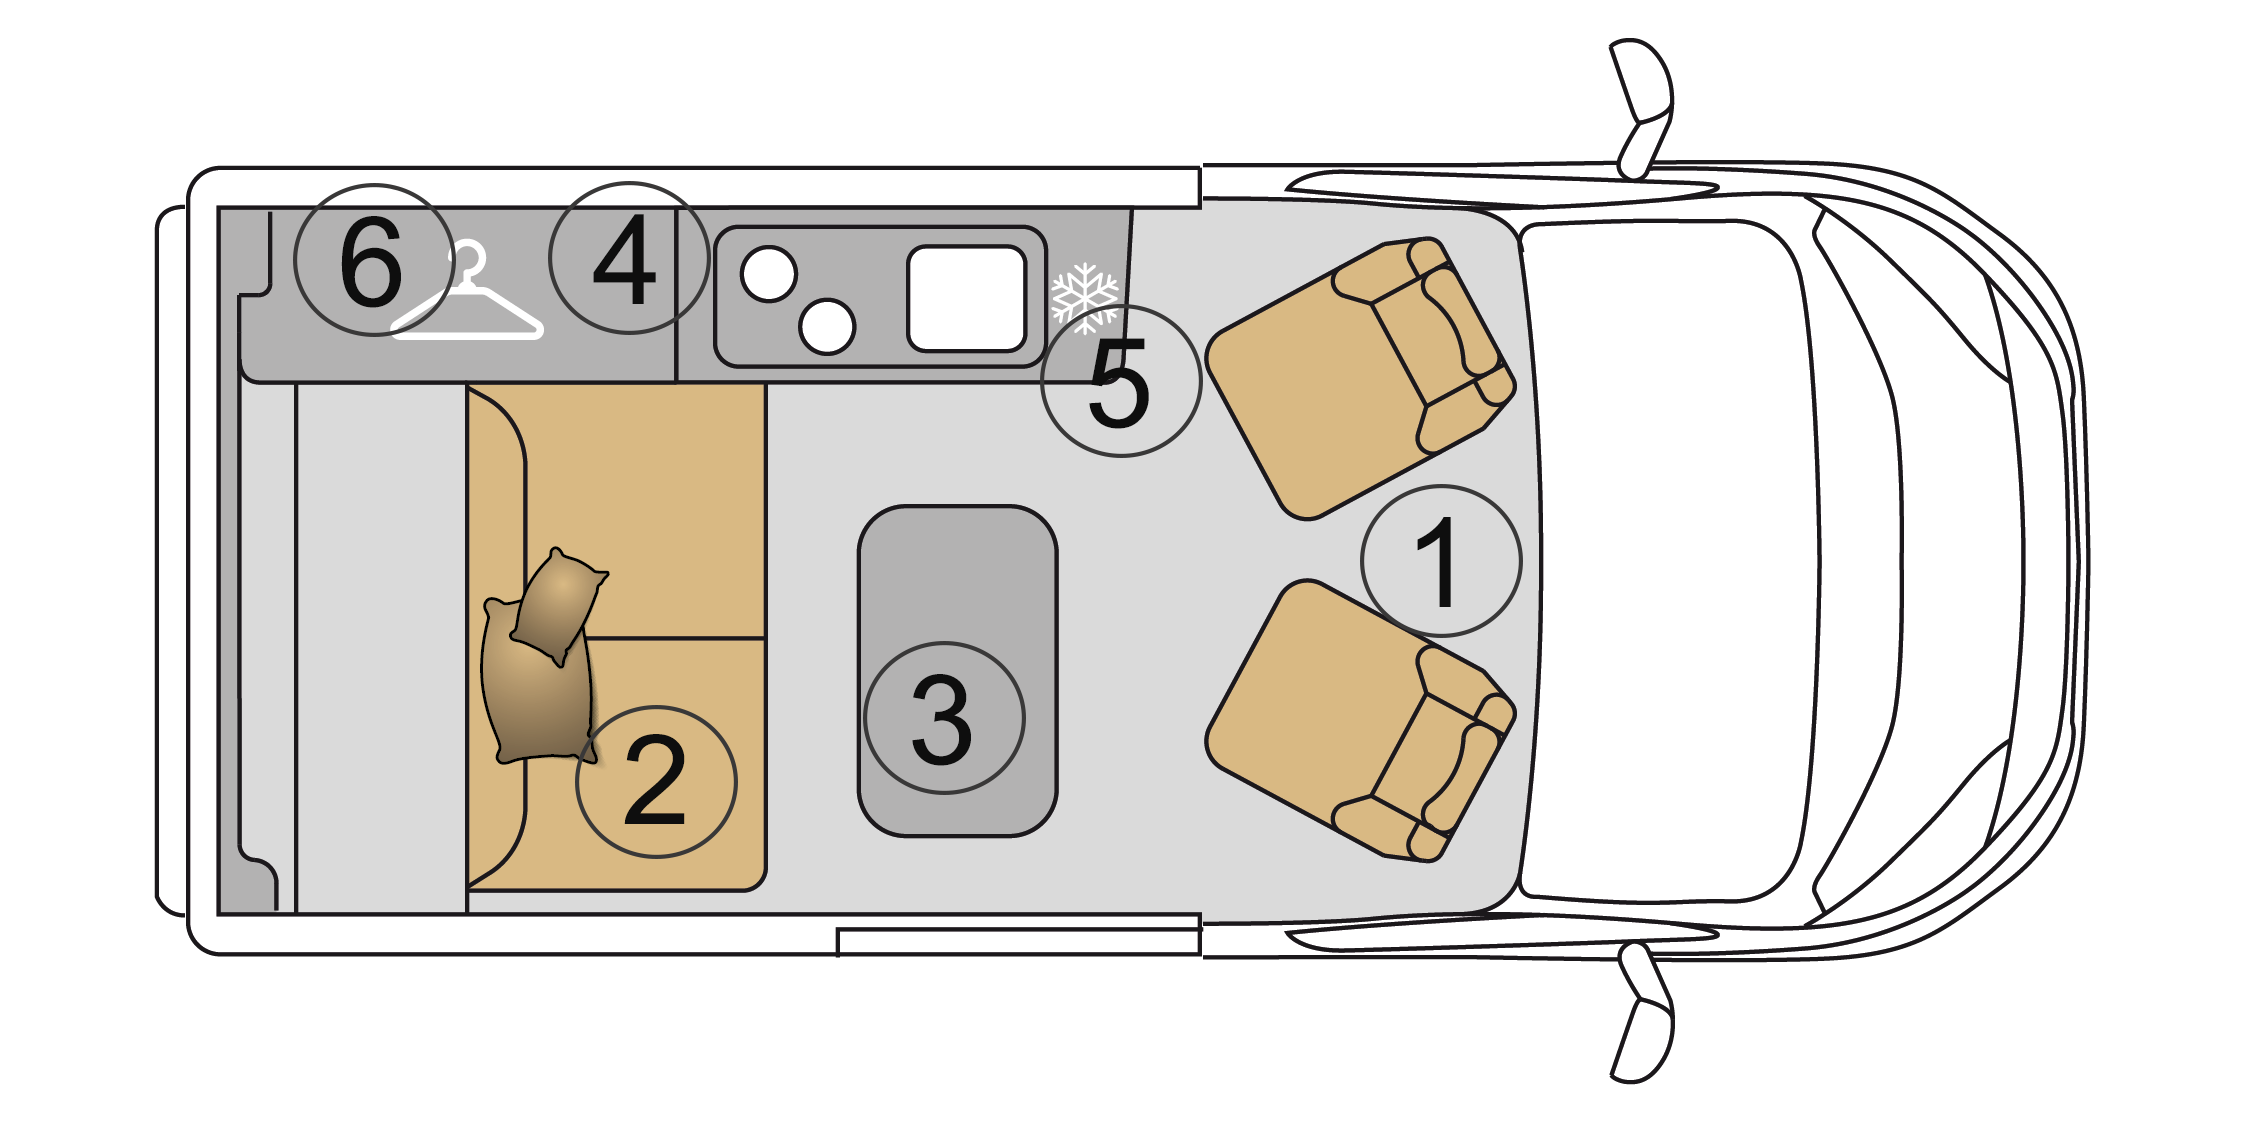 Campervan 2 Grundriss campingbus